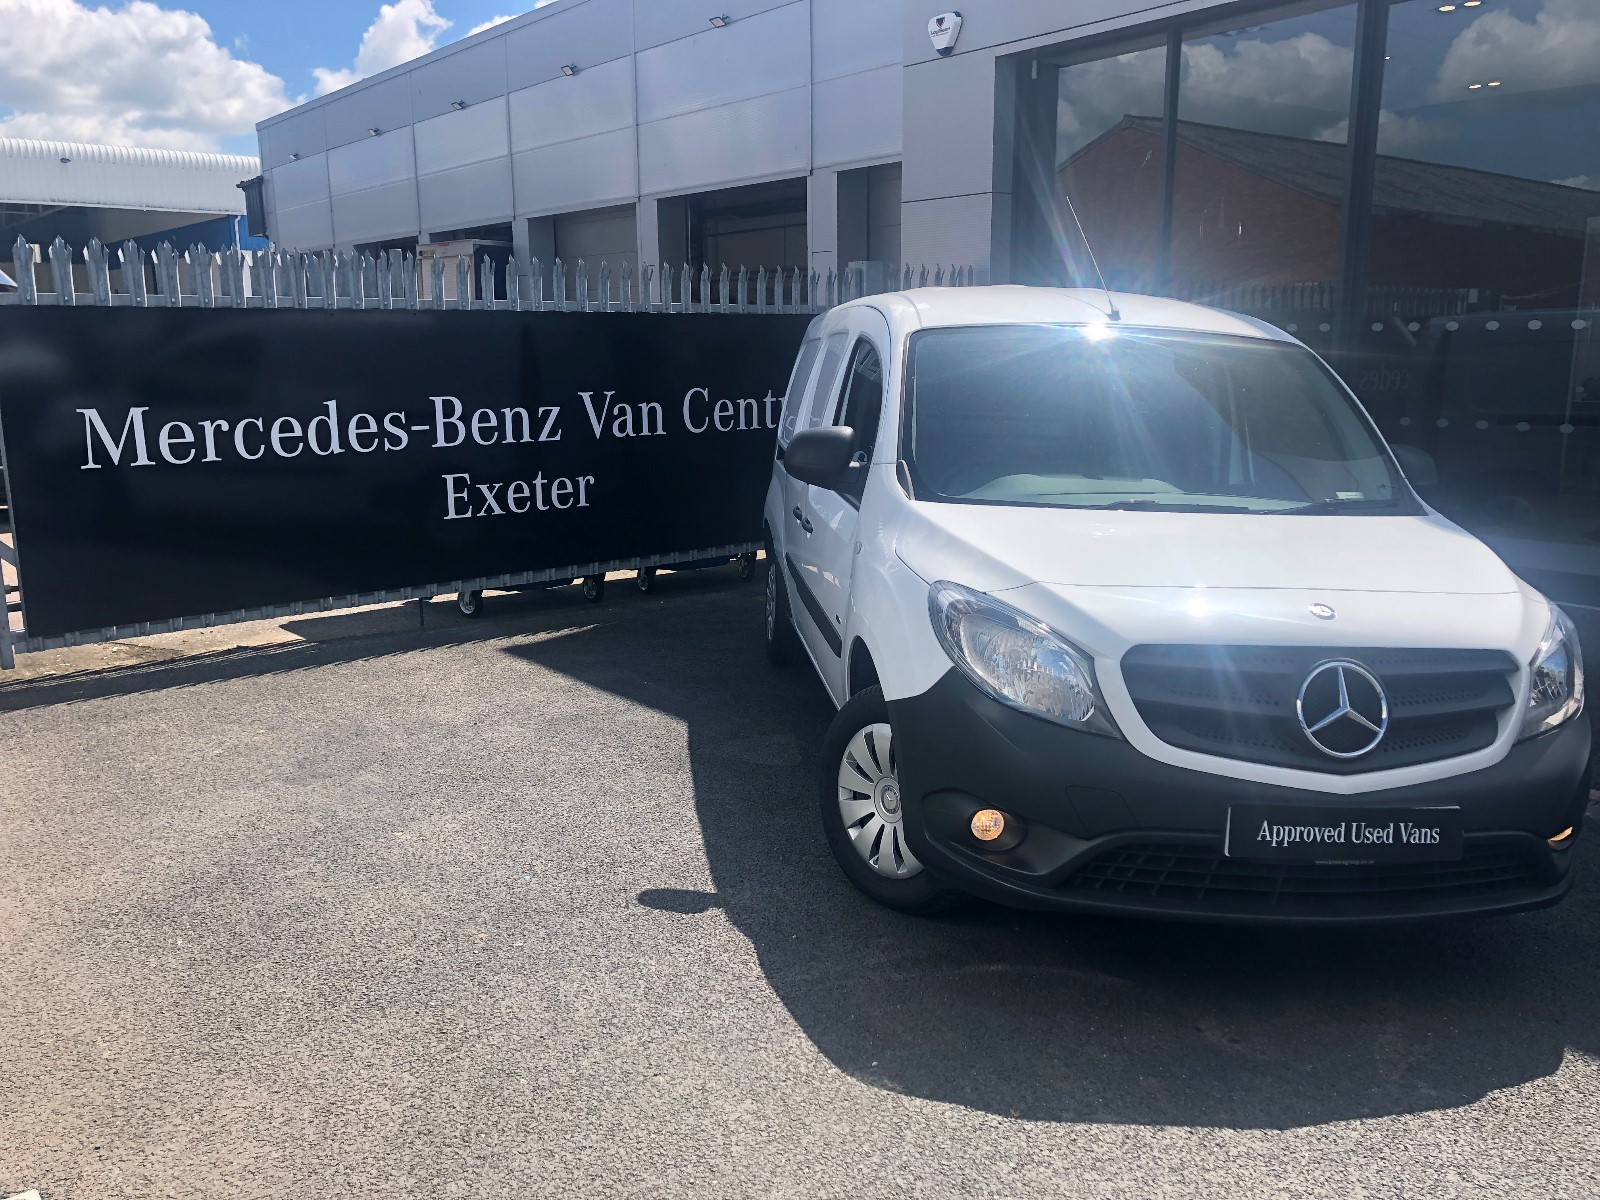 26aae3c01f 2018(68) Mercedes-Benz Citan 109 CDI BLUEEFFICIENCY